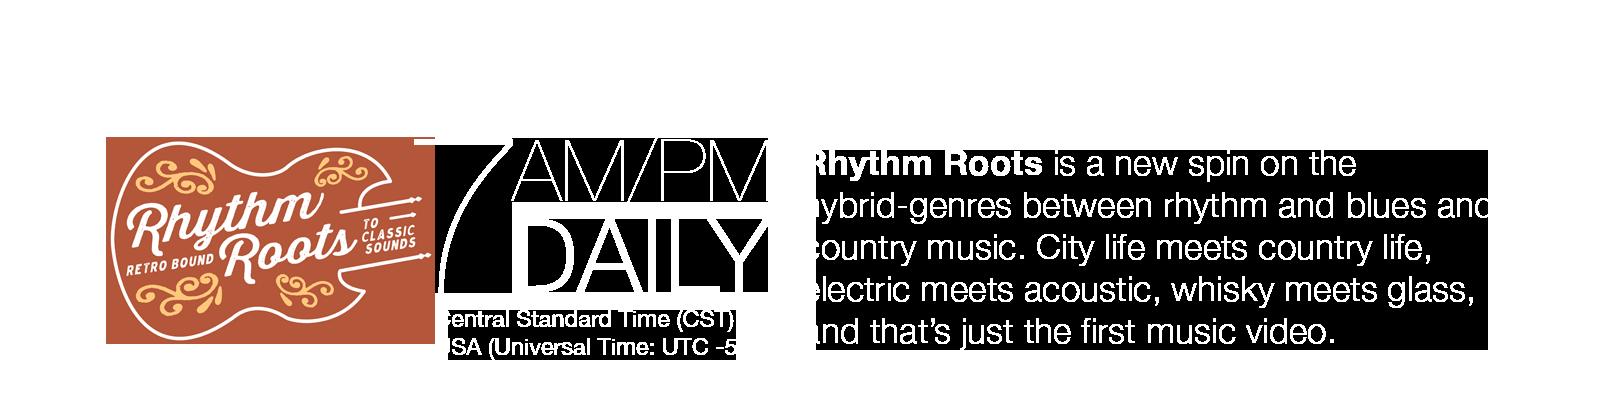 HomePageSlide-RythmRoots7